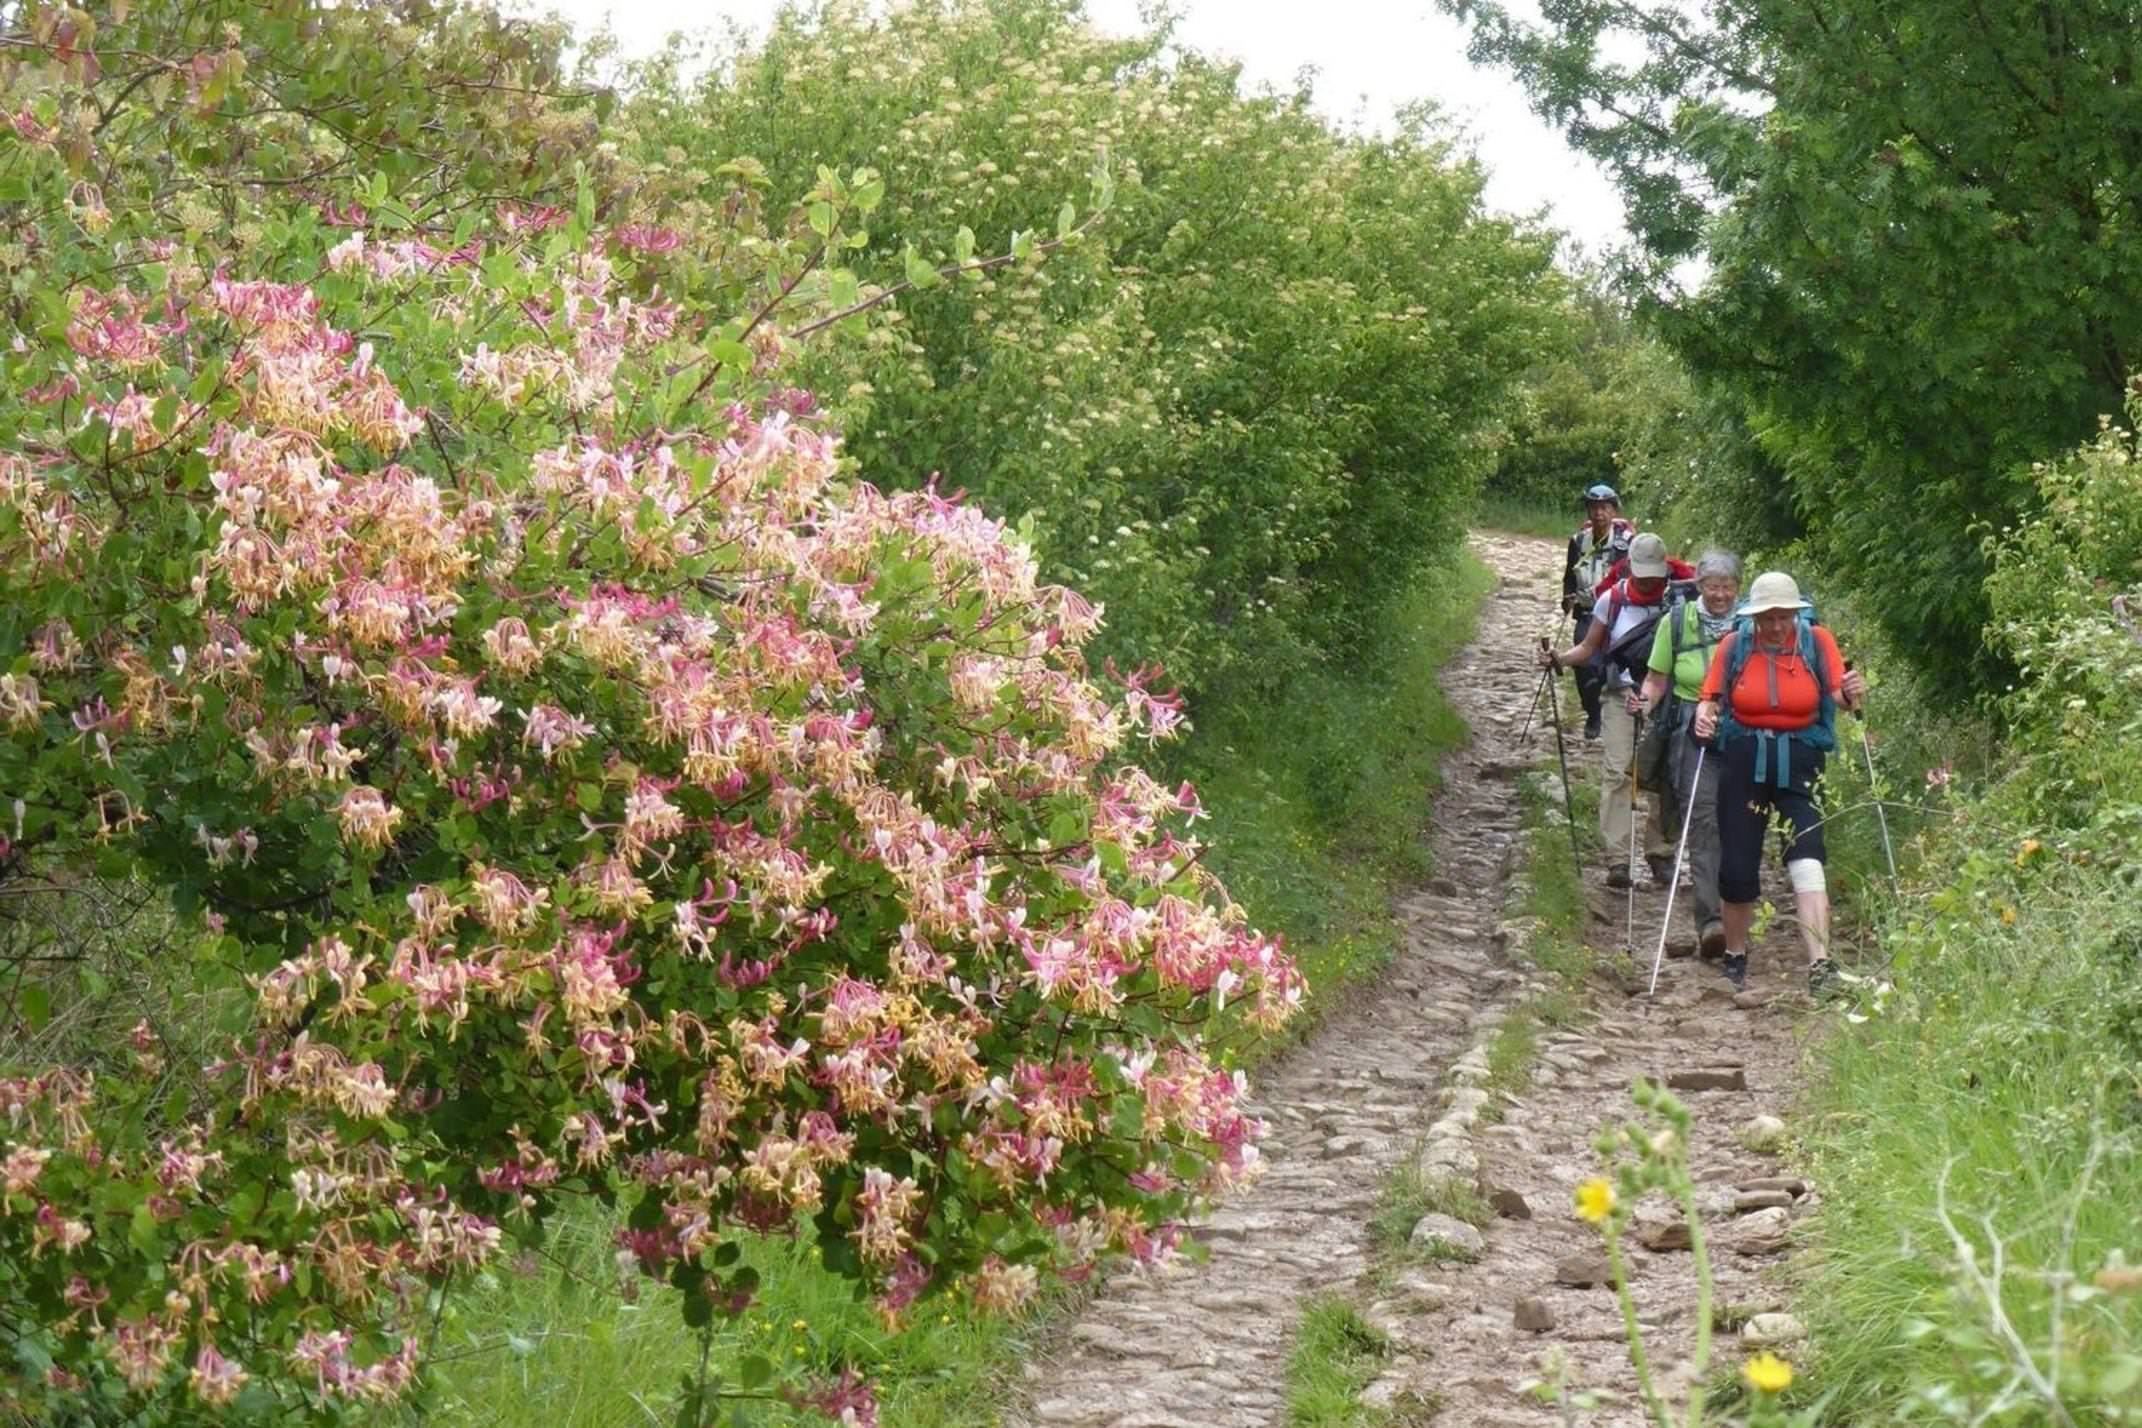 Spain camino ladies walking pink wild flowers and greenery